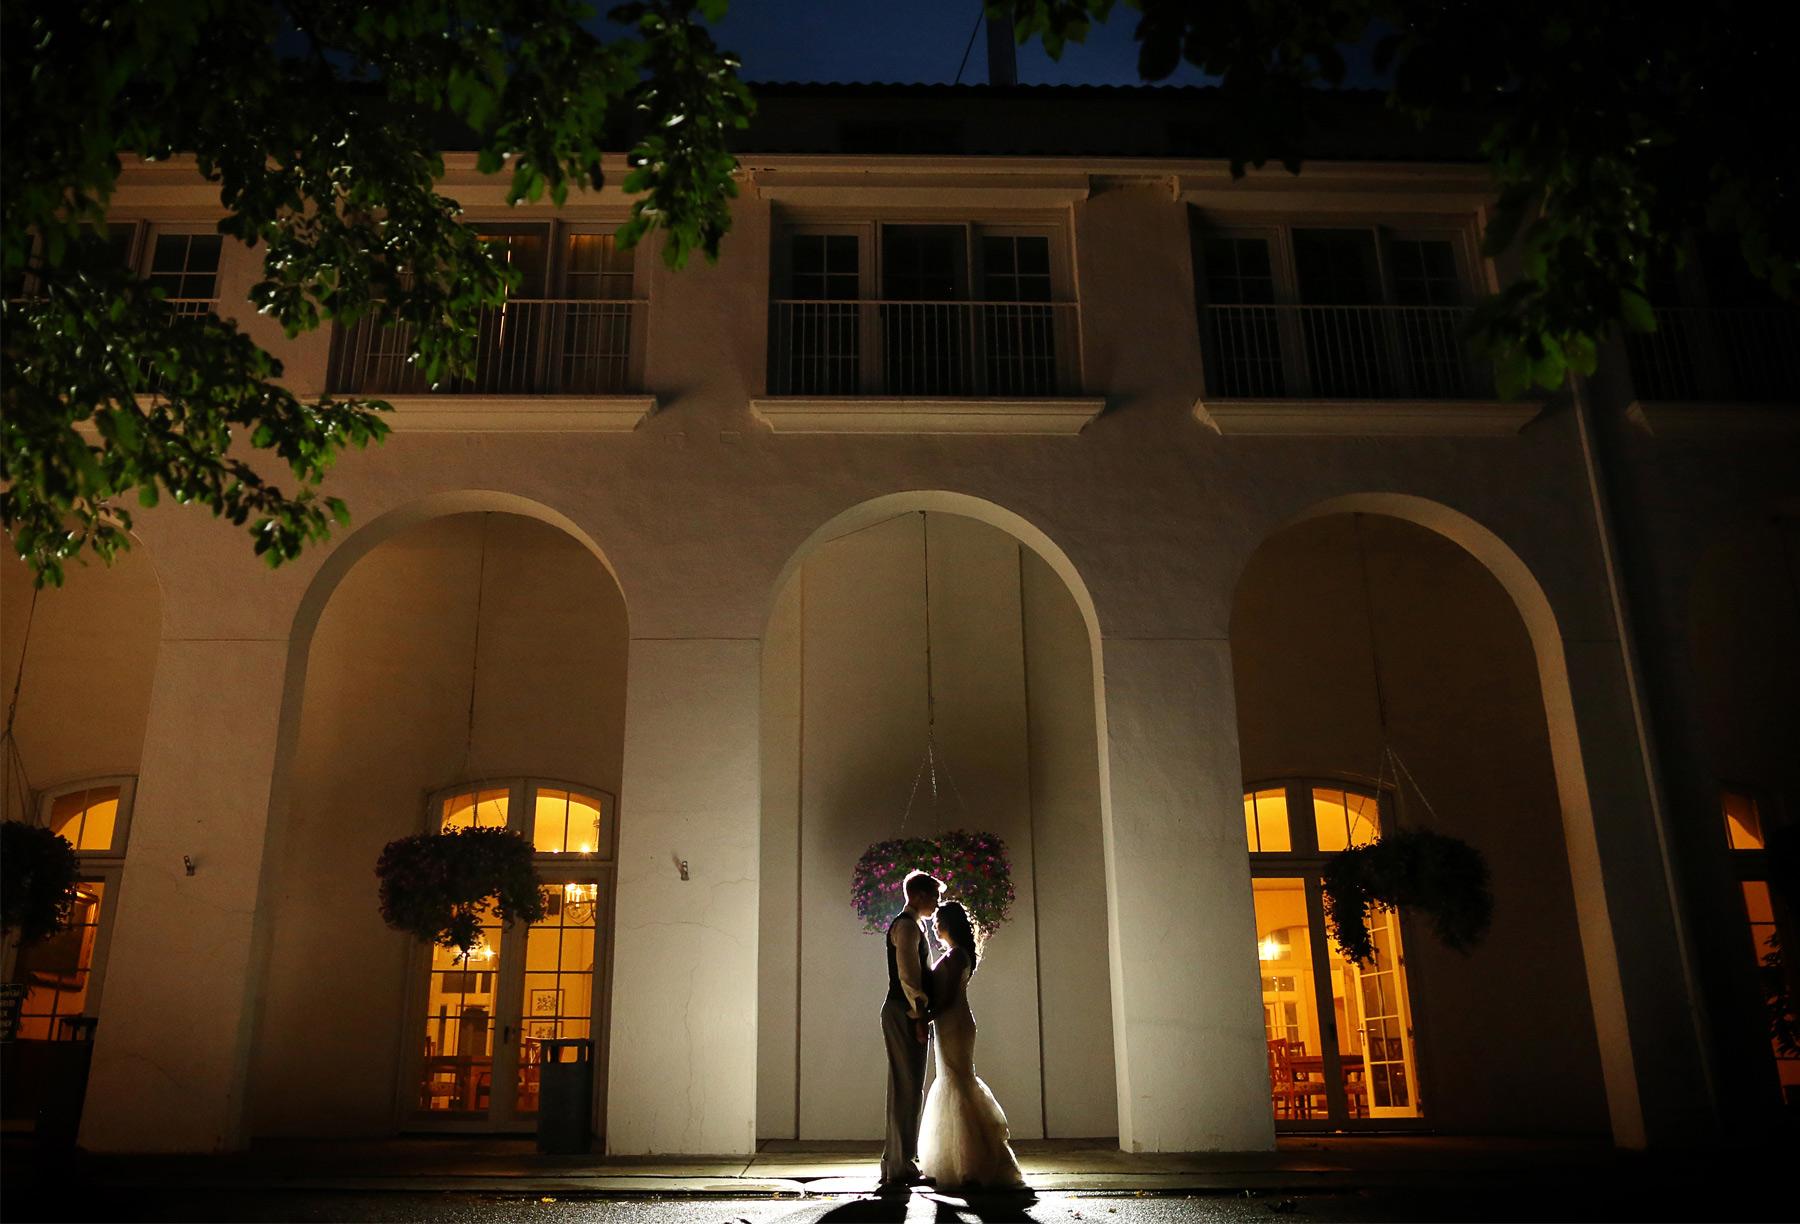 17-Minneapolis-Minnesota-Wedding-Photography-by-Vick-Photography-Lafayette-Country-Club-Night-Photography-Daphne-&-Austin.jpg